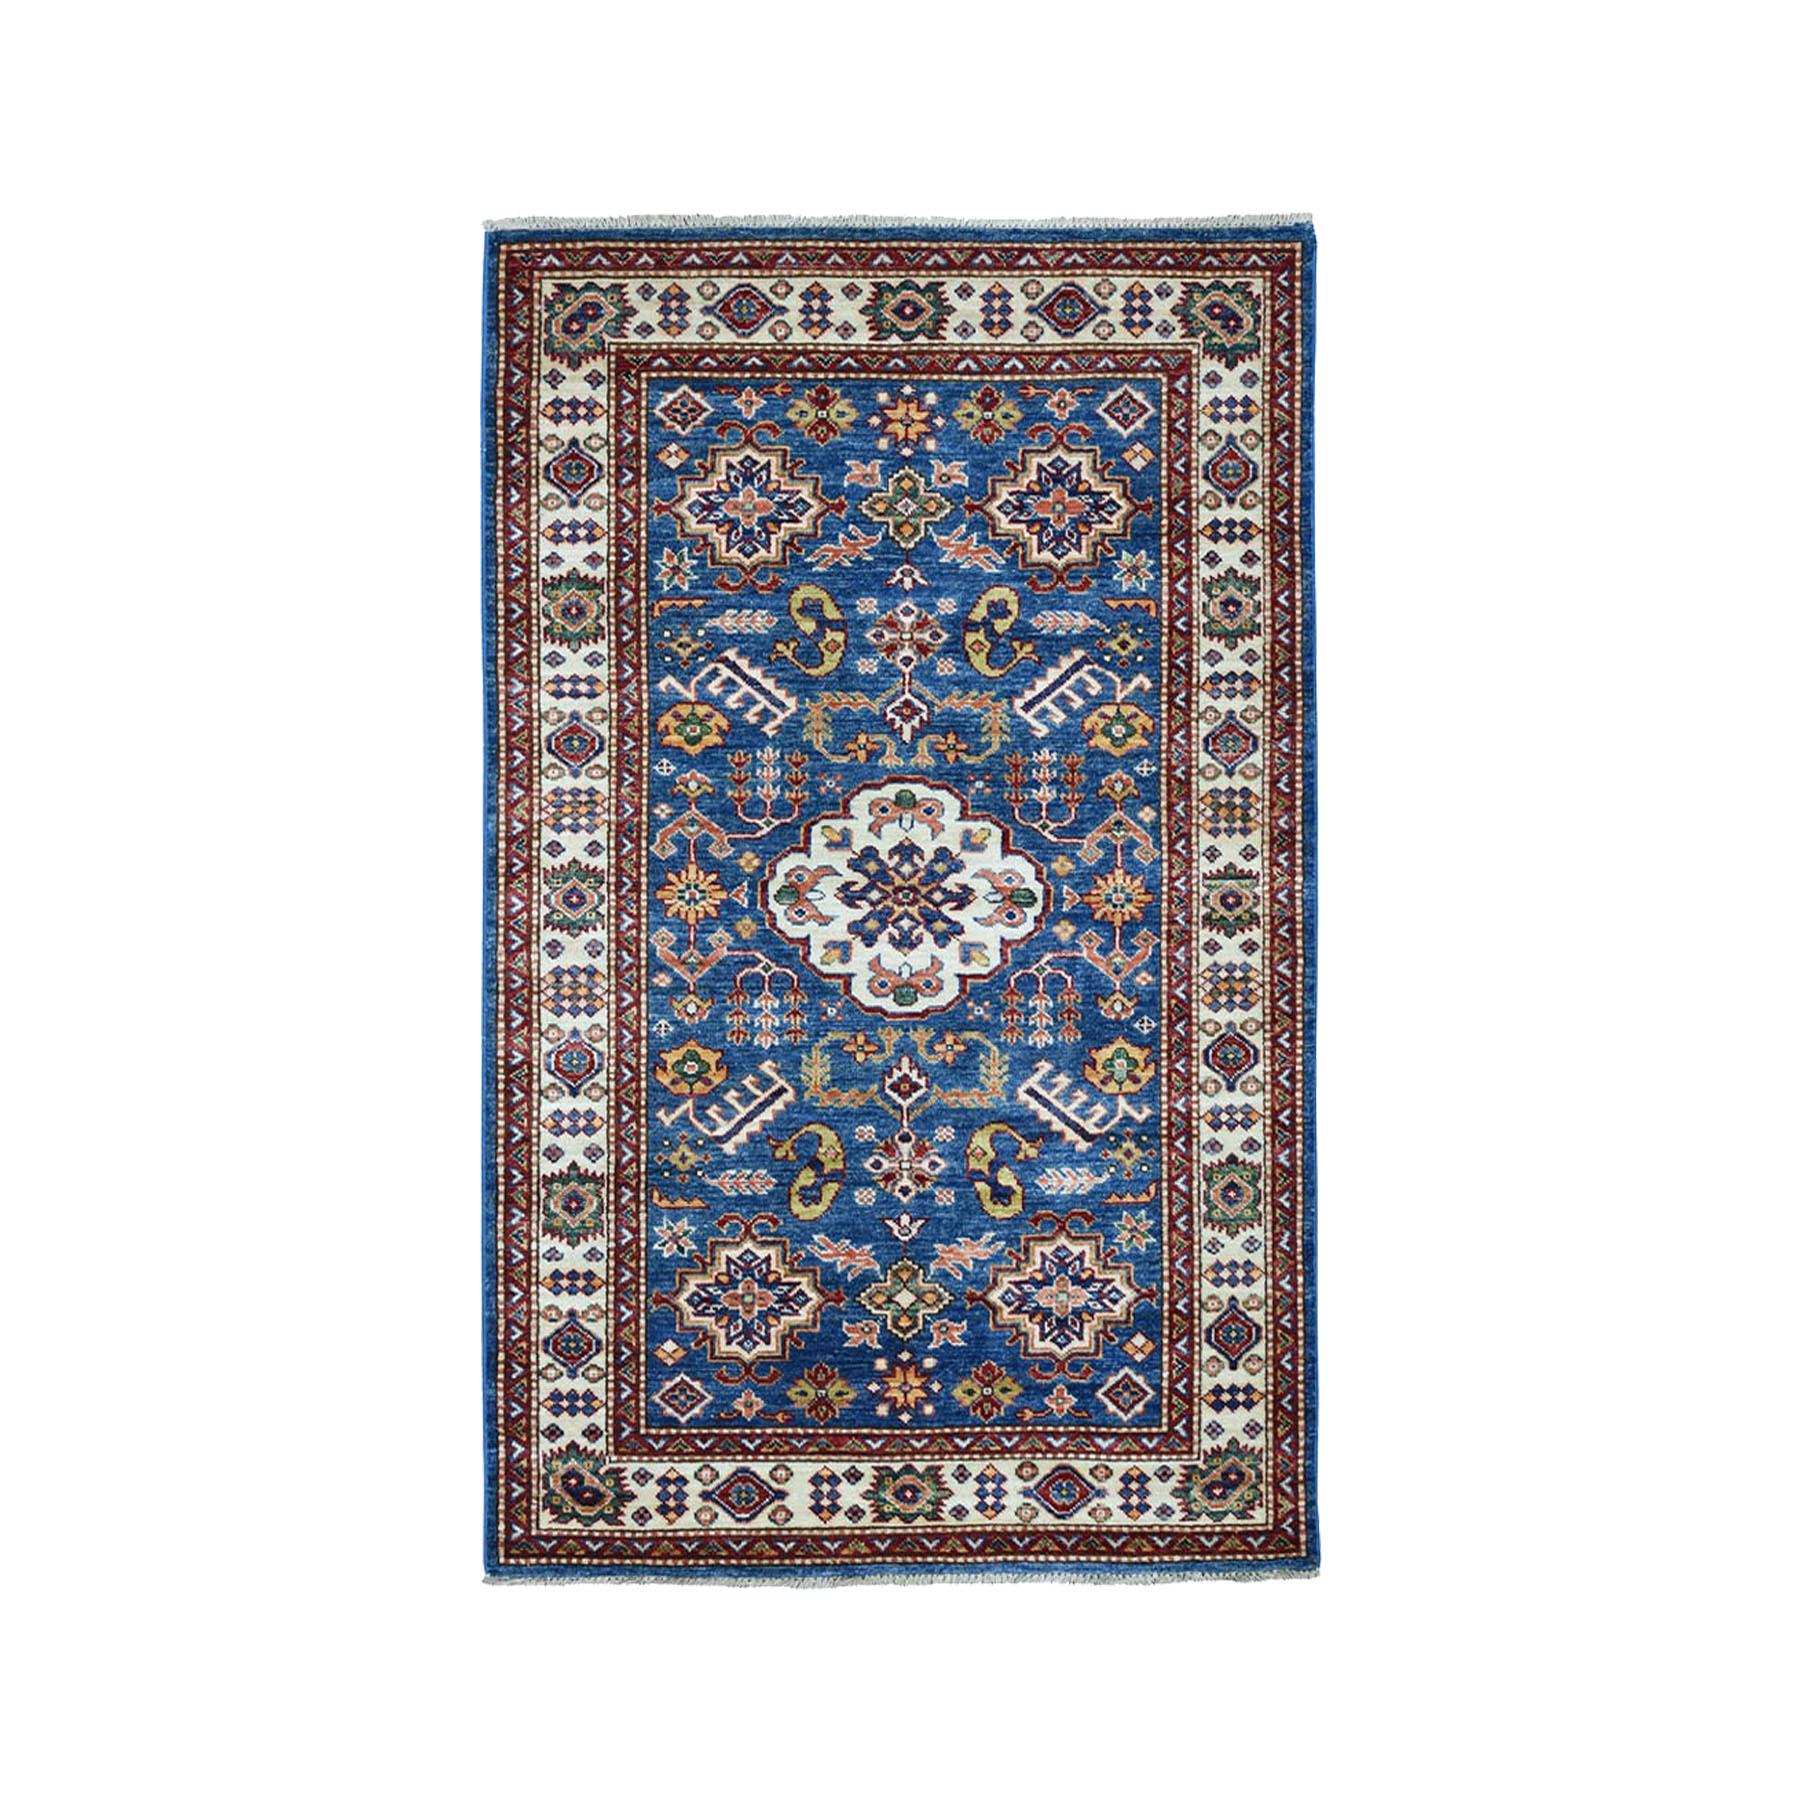 "3'3""X5'2"" Blue Super Kazak Pure Wool Geometric Design Hand-Knotted Oriental Rug moae0b9b"